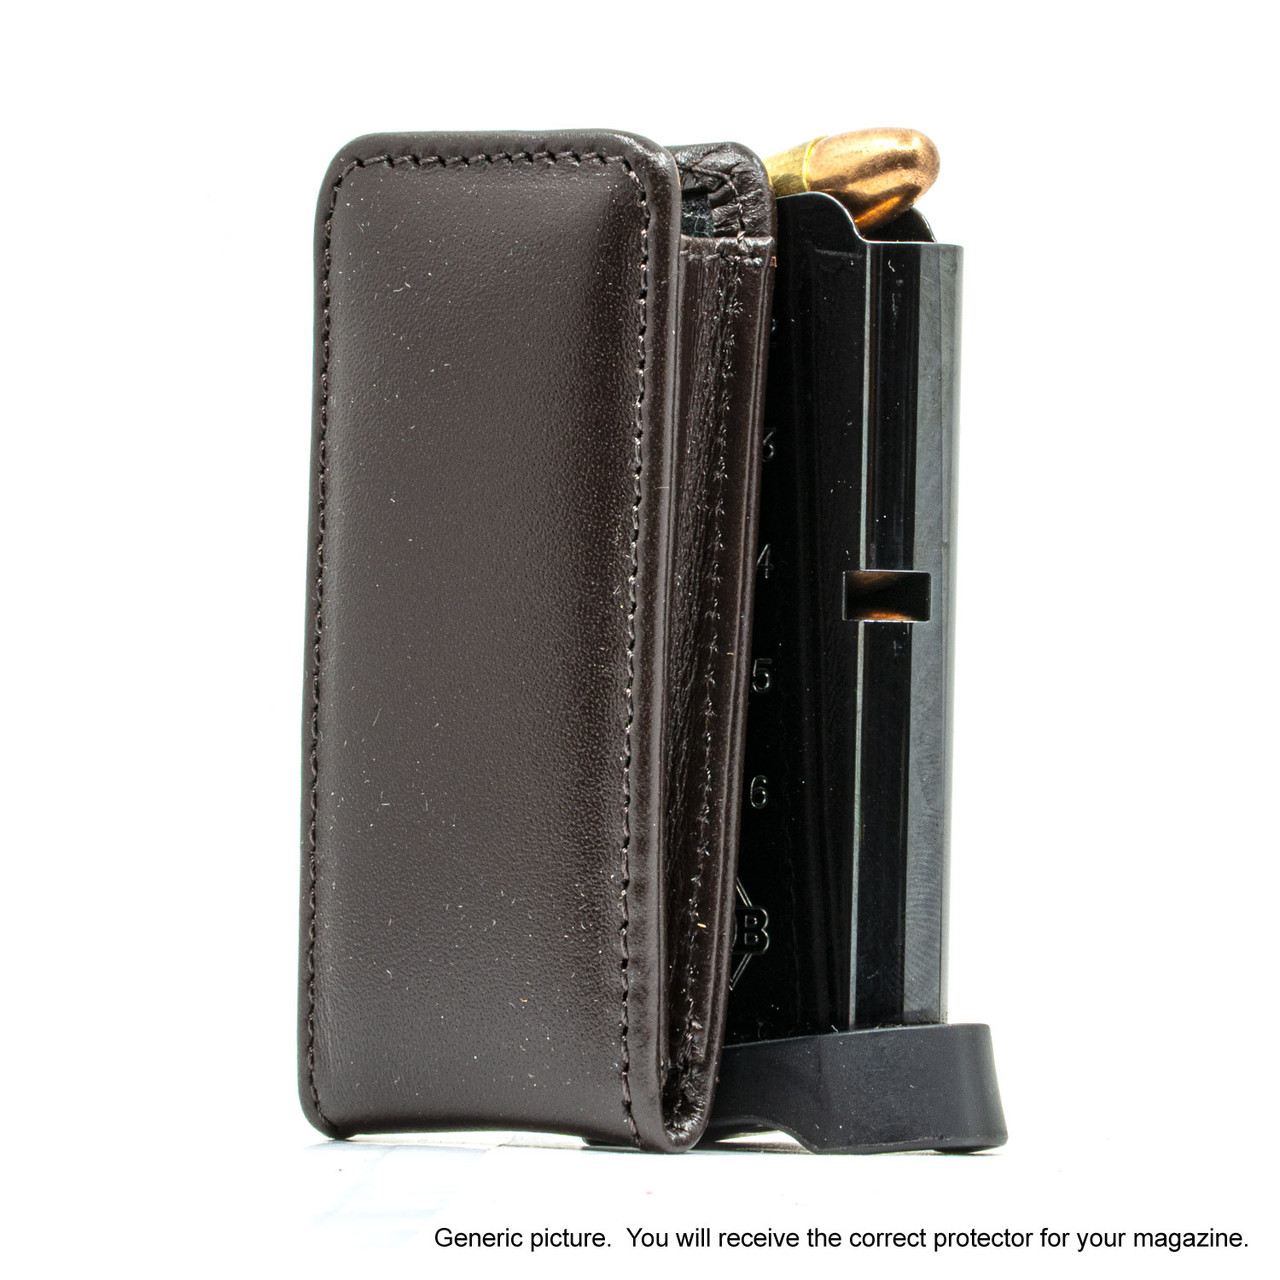 Kahr K40 Brown Leather Magazine Pocket Protector